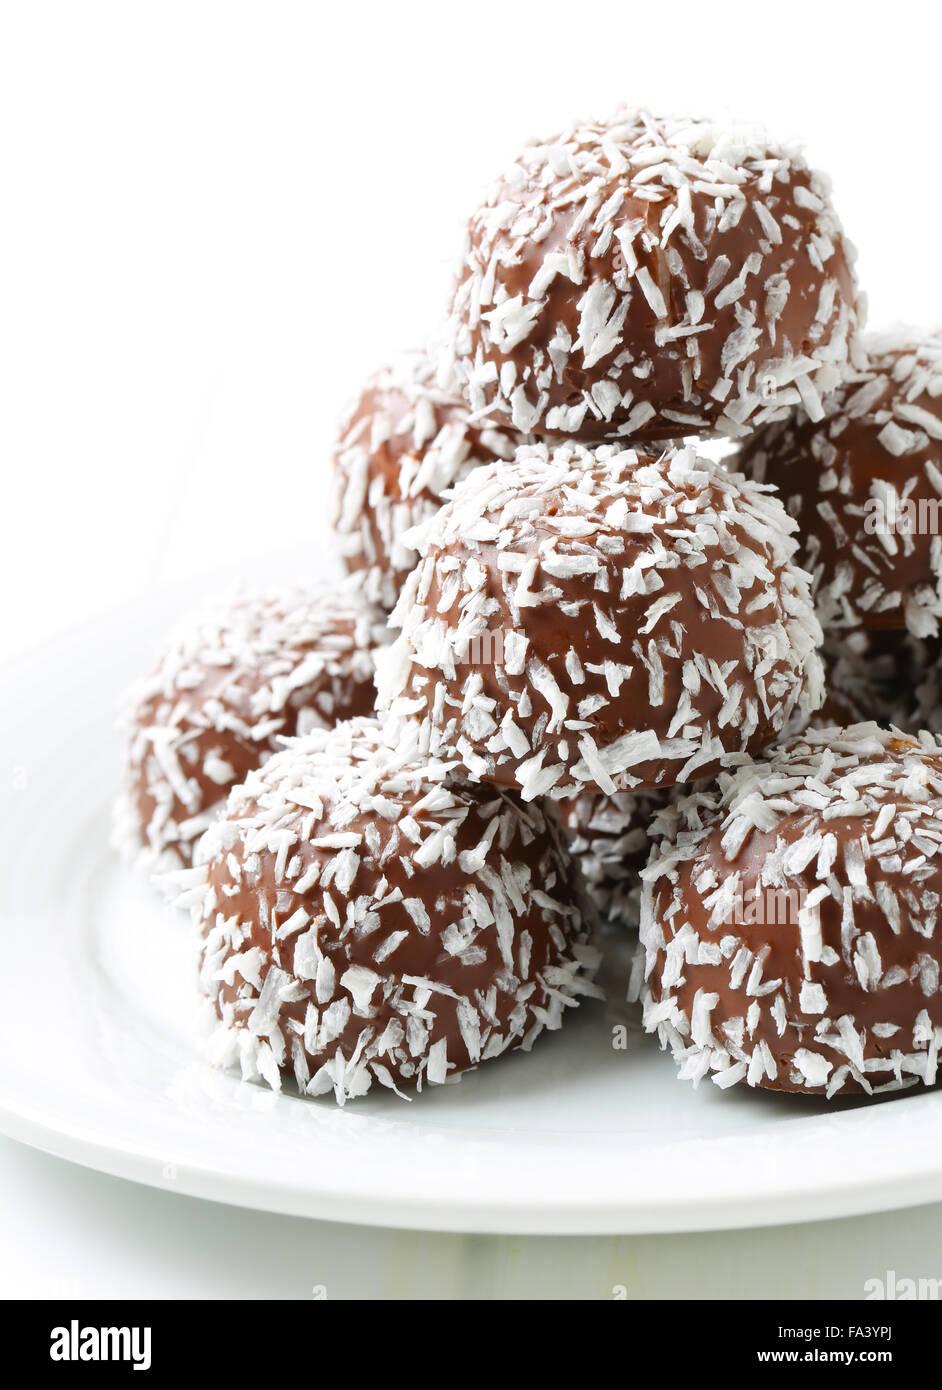 No-Backen Schokolade Schneeball Cookies in Kokos gerollt Stockfoto ...